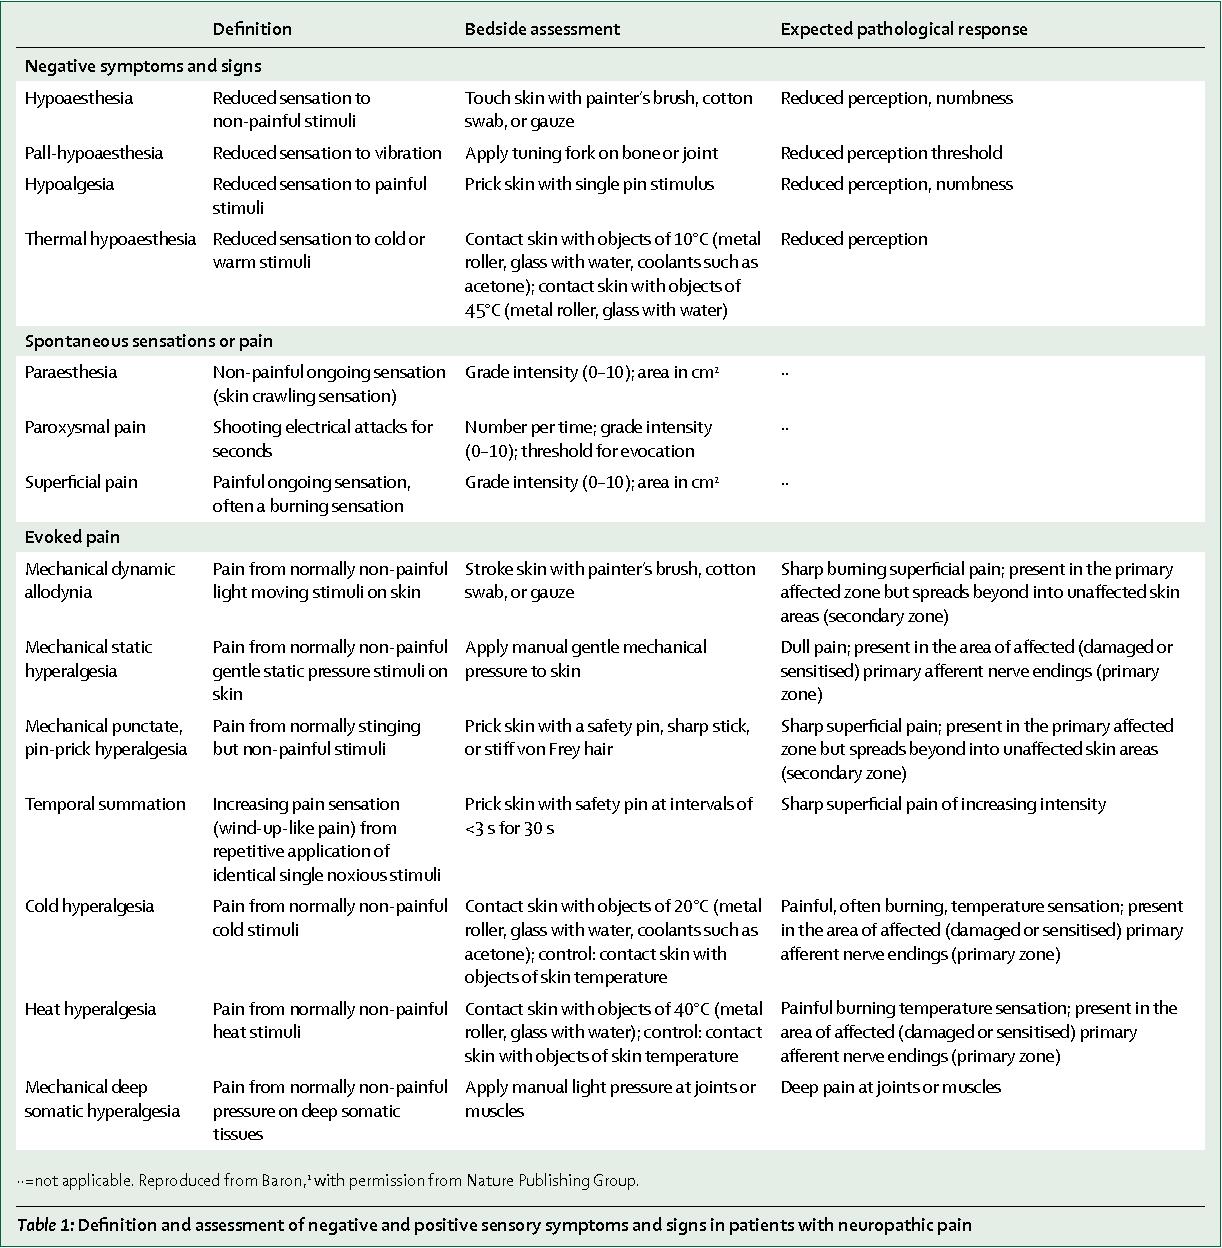 Neuropathic pain: diagnosis, pathophysiological mechanisms, and treatment. - Semantic Scholar